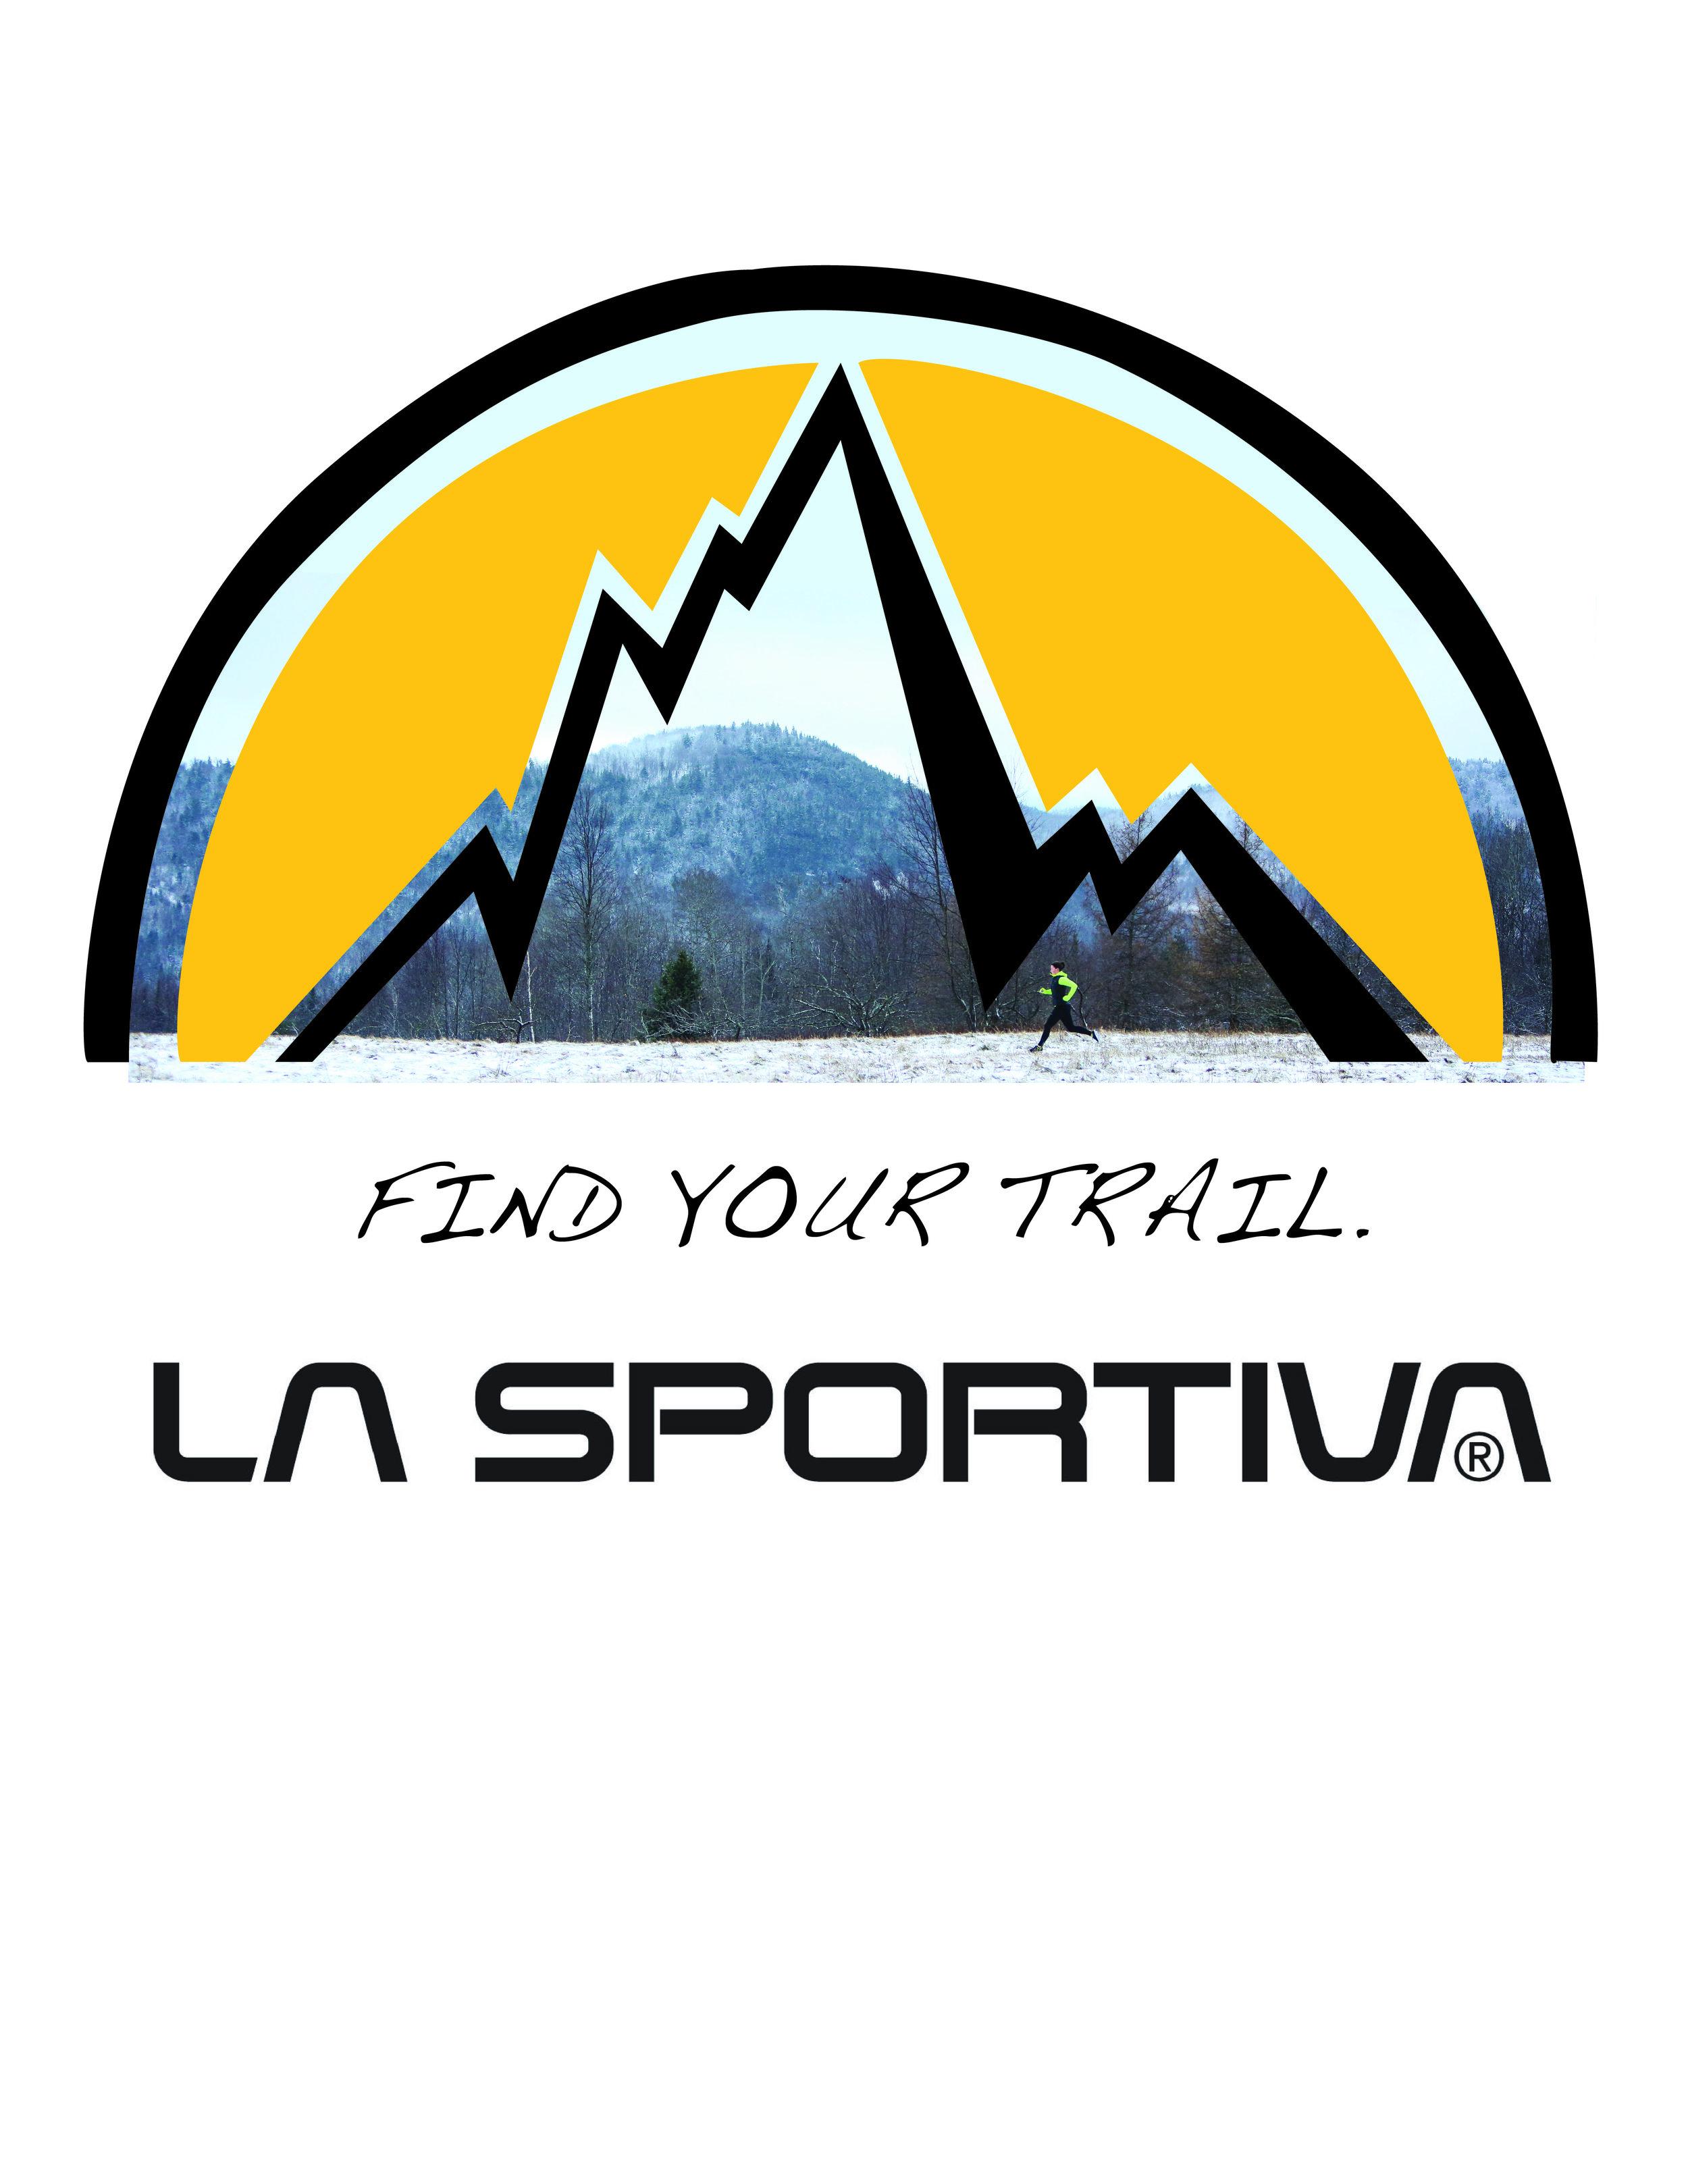 LaSportiva AD-02-01.jpg